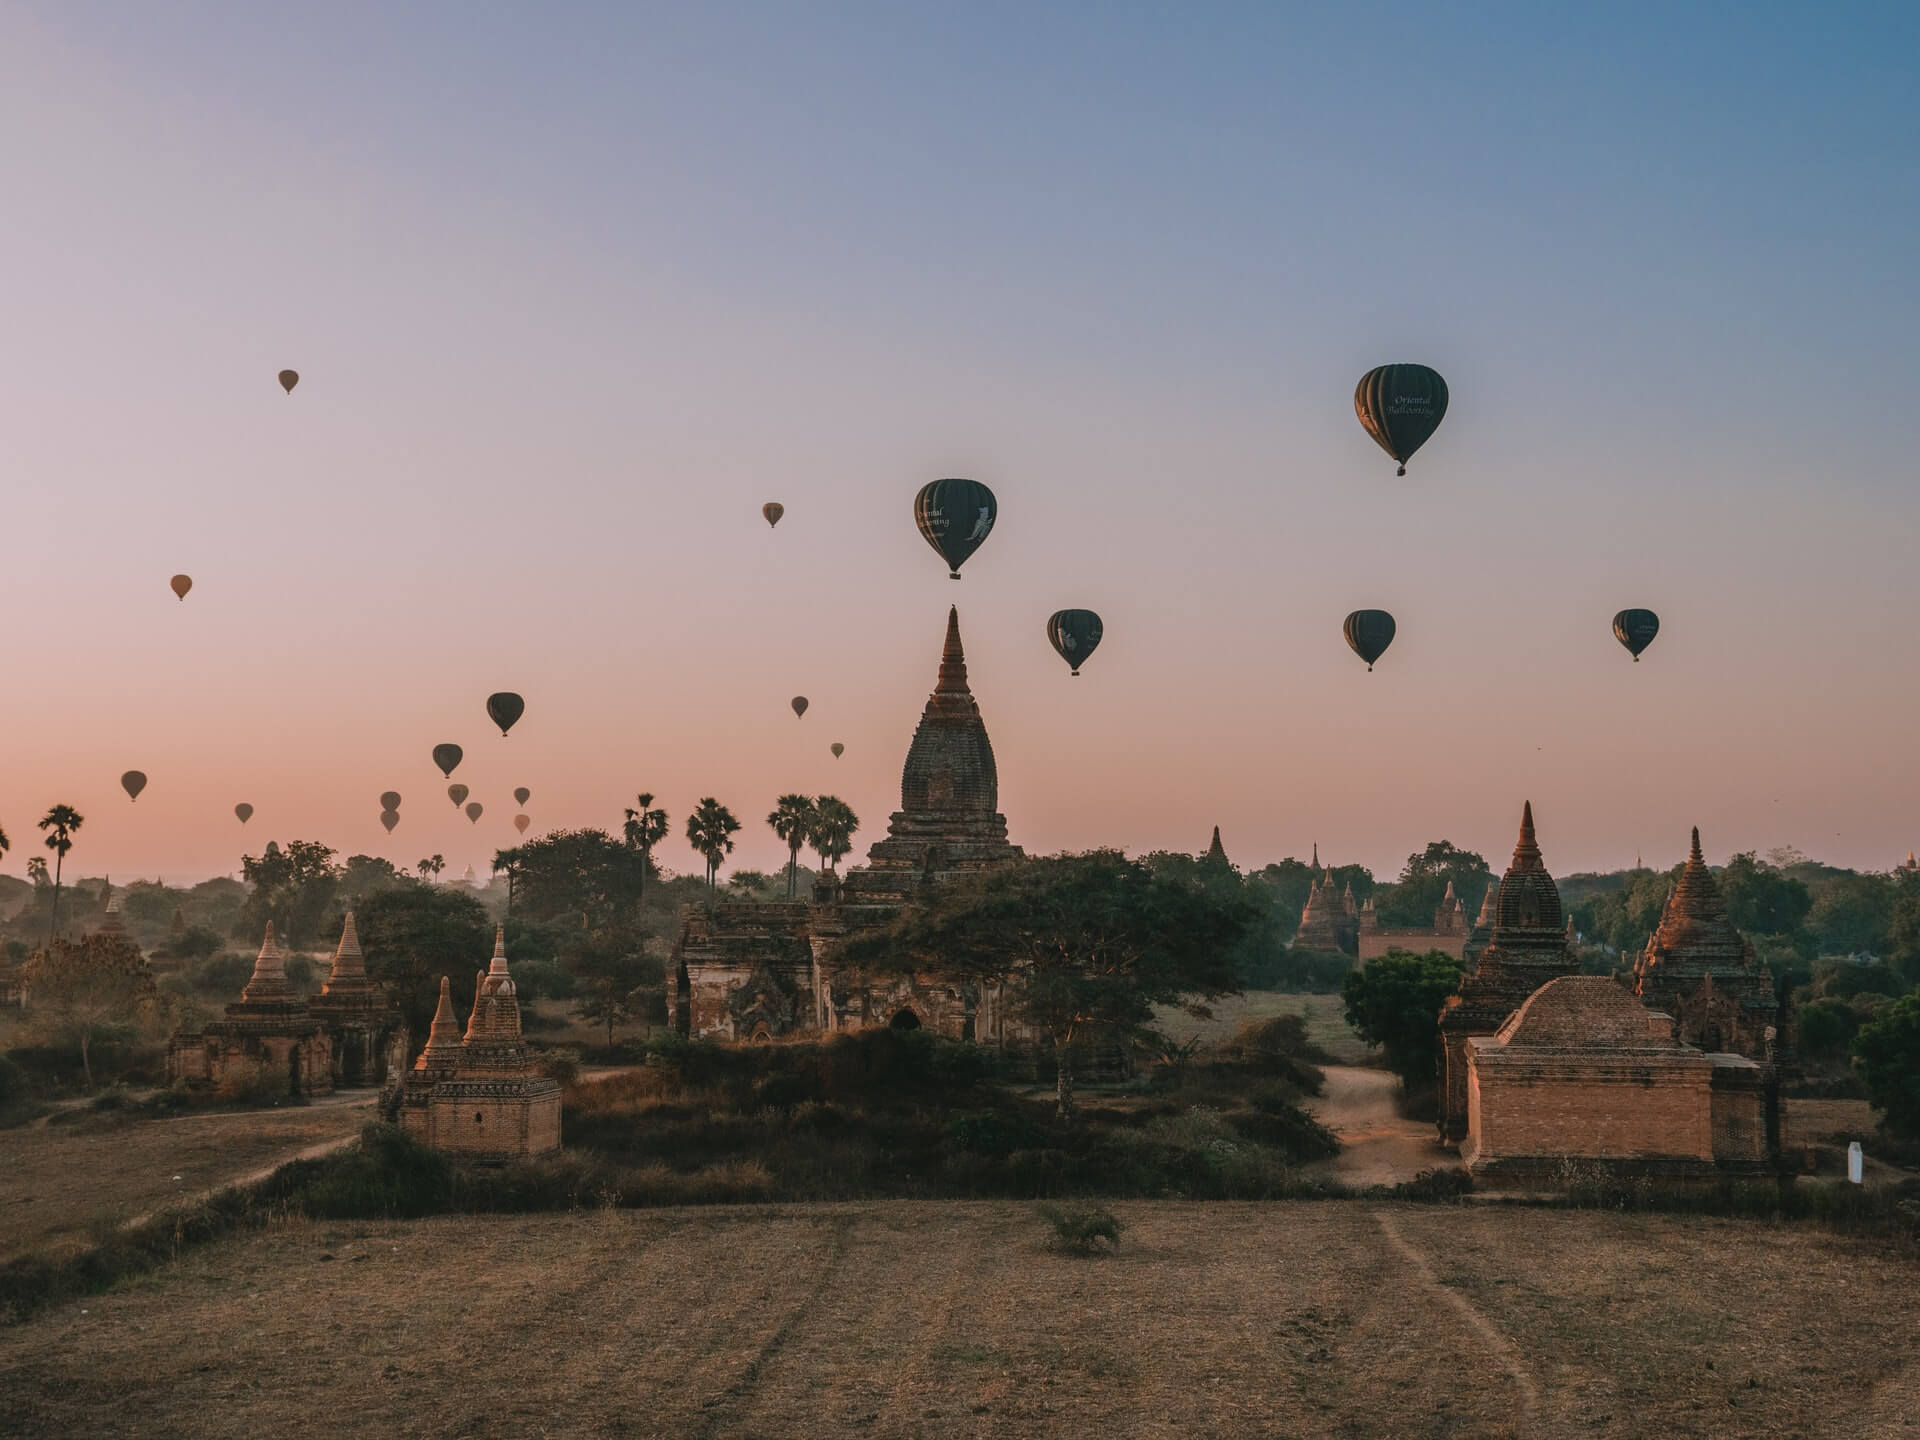 Hot air ballooning over Bagan - fun tourist activity in Myanmar